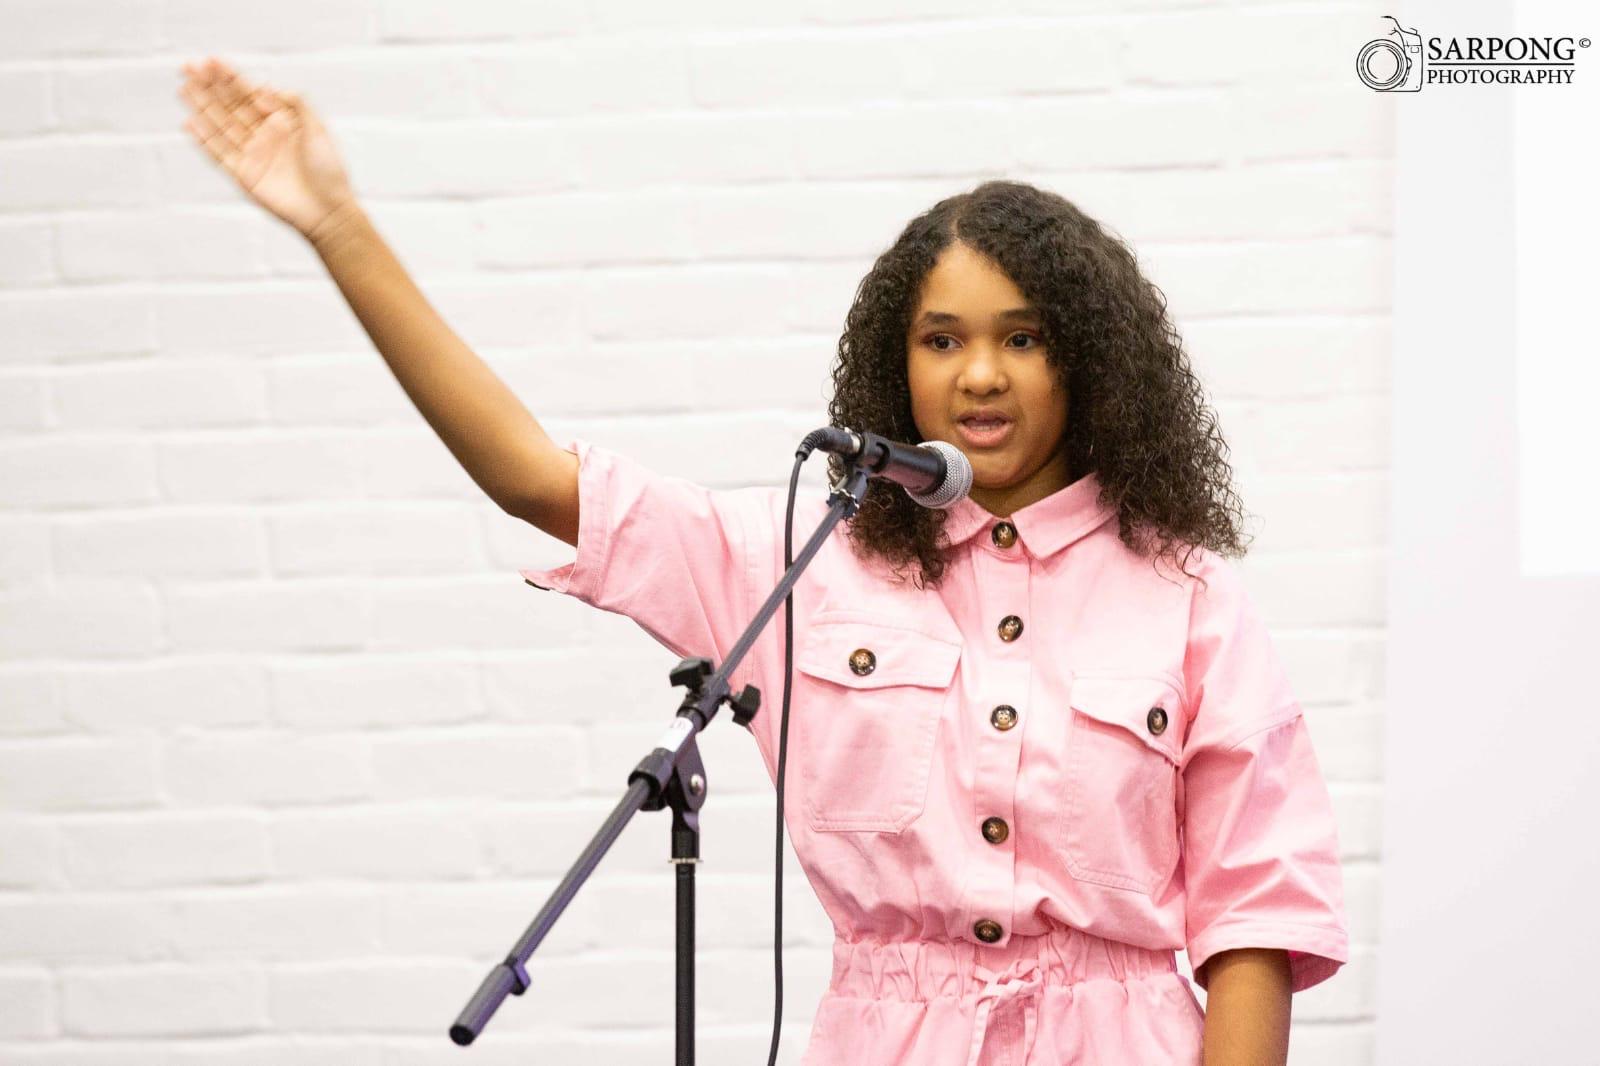 Vanessa speaking on stage